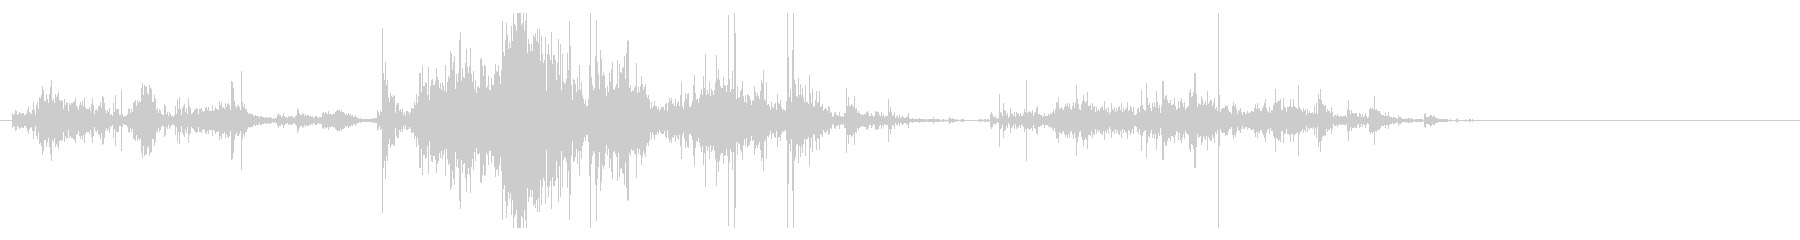 Zombie ゾンビが飛びついてくる音1の未再生の波形